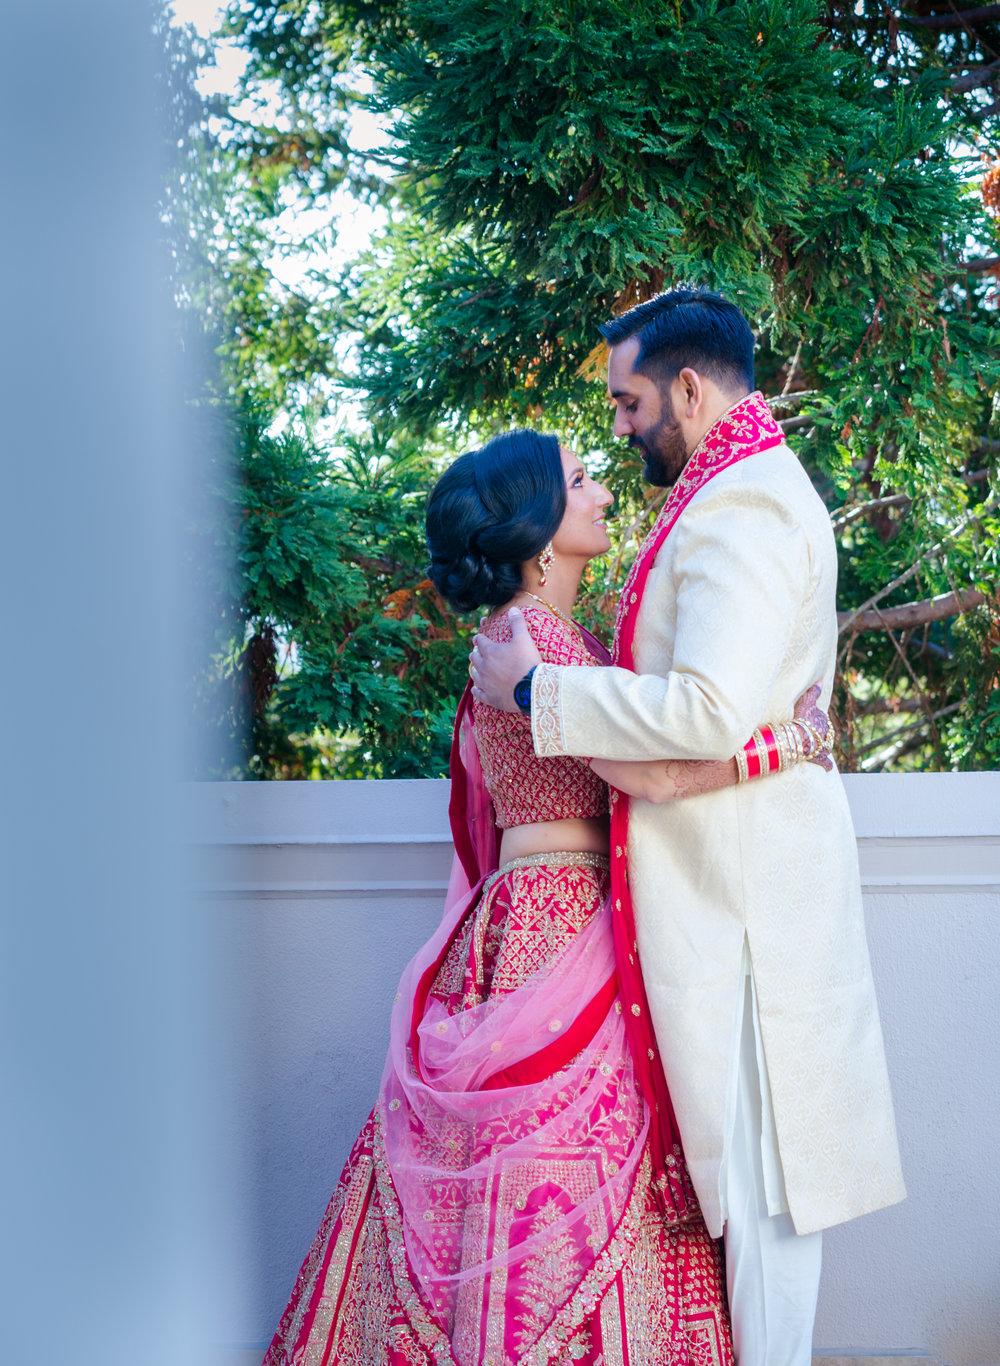 Vermilion Weddings & Events: San Francisco Bay Area Wedding Planner, Monika & Vishal